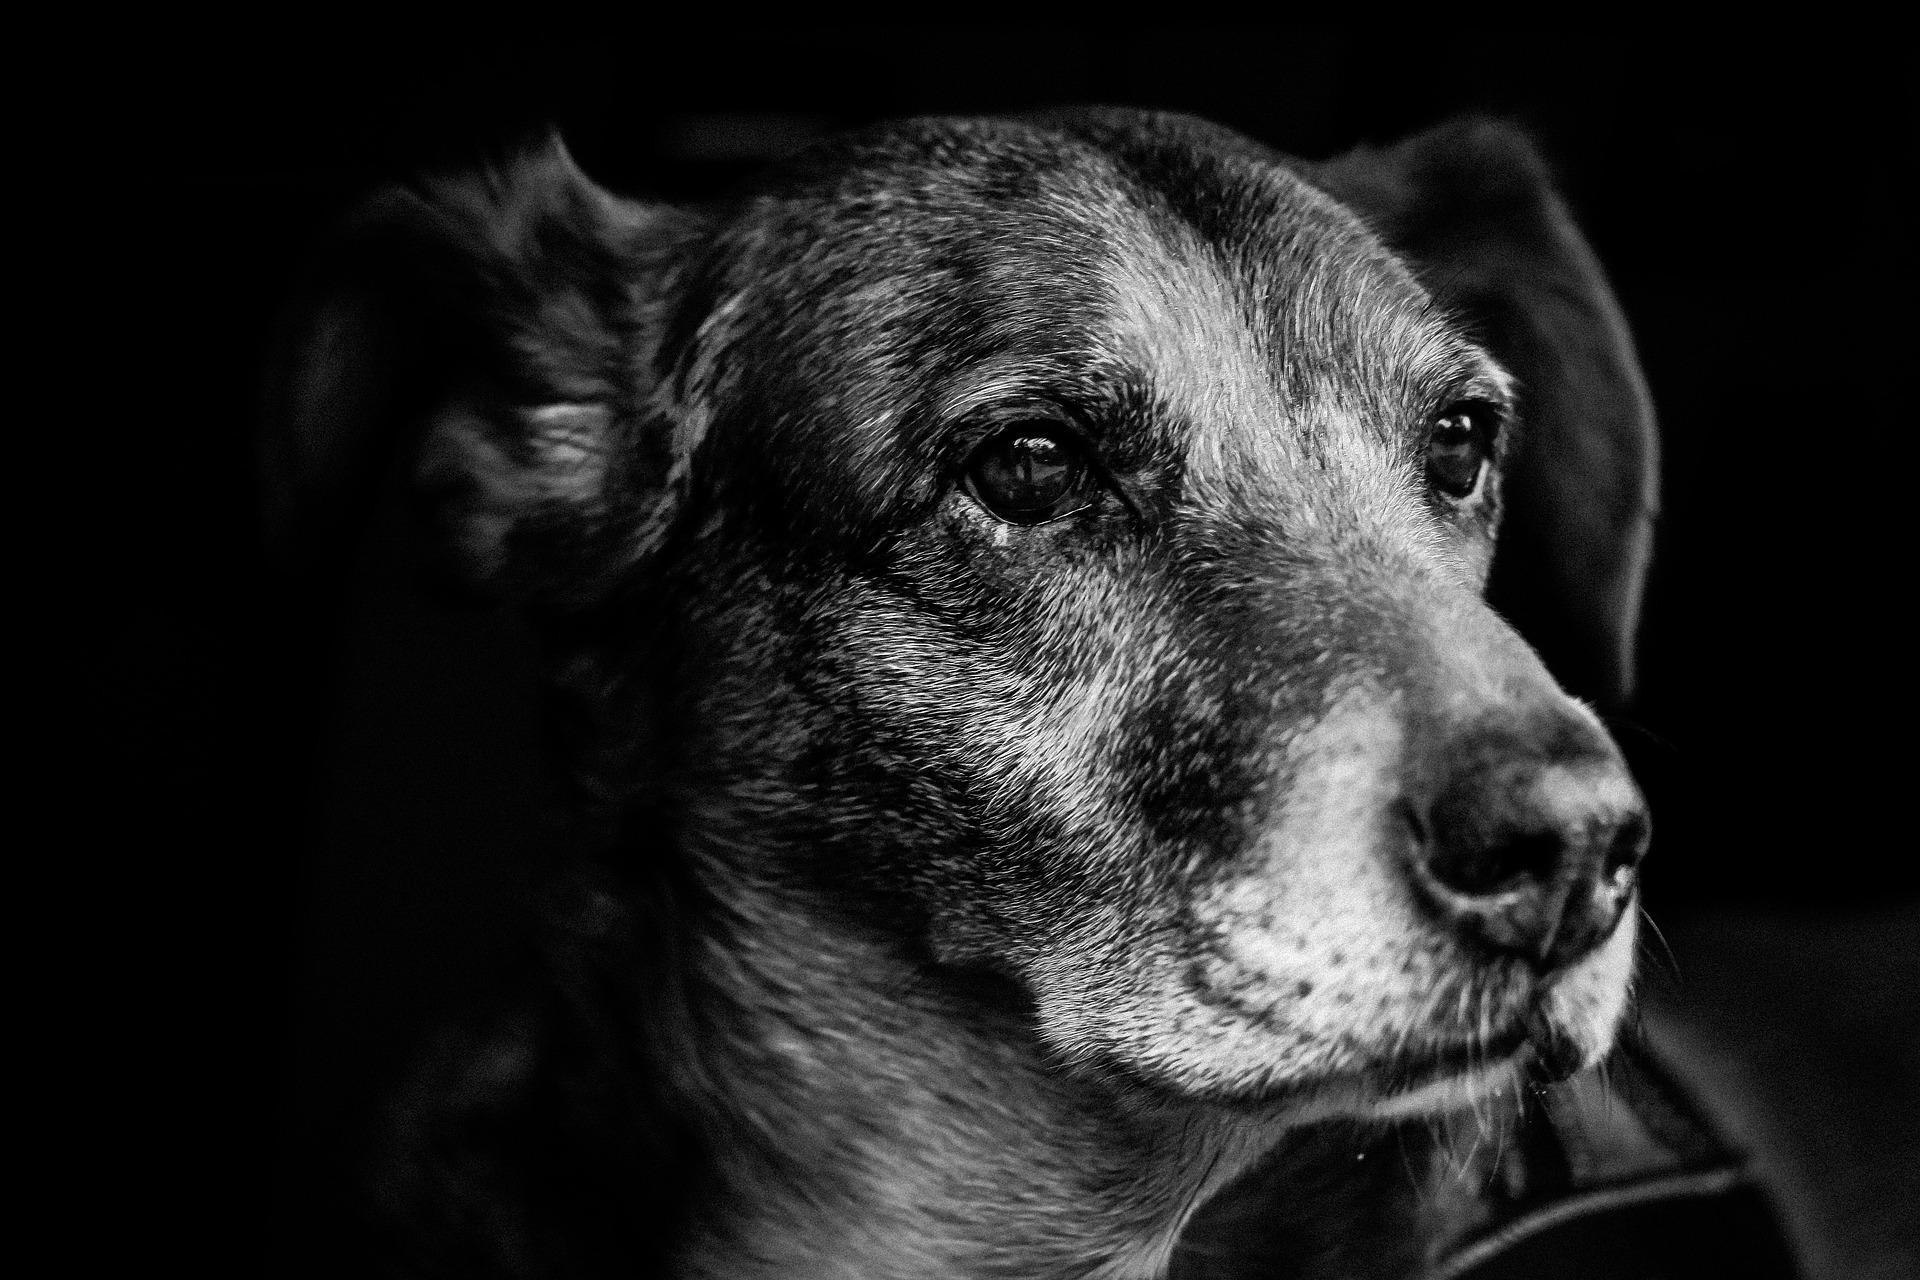 dog-903213_1920.jpg